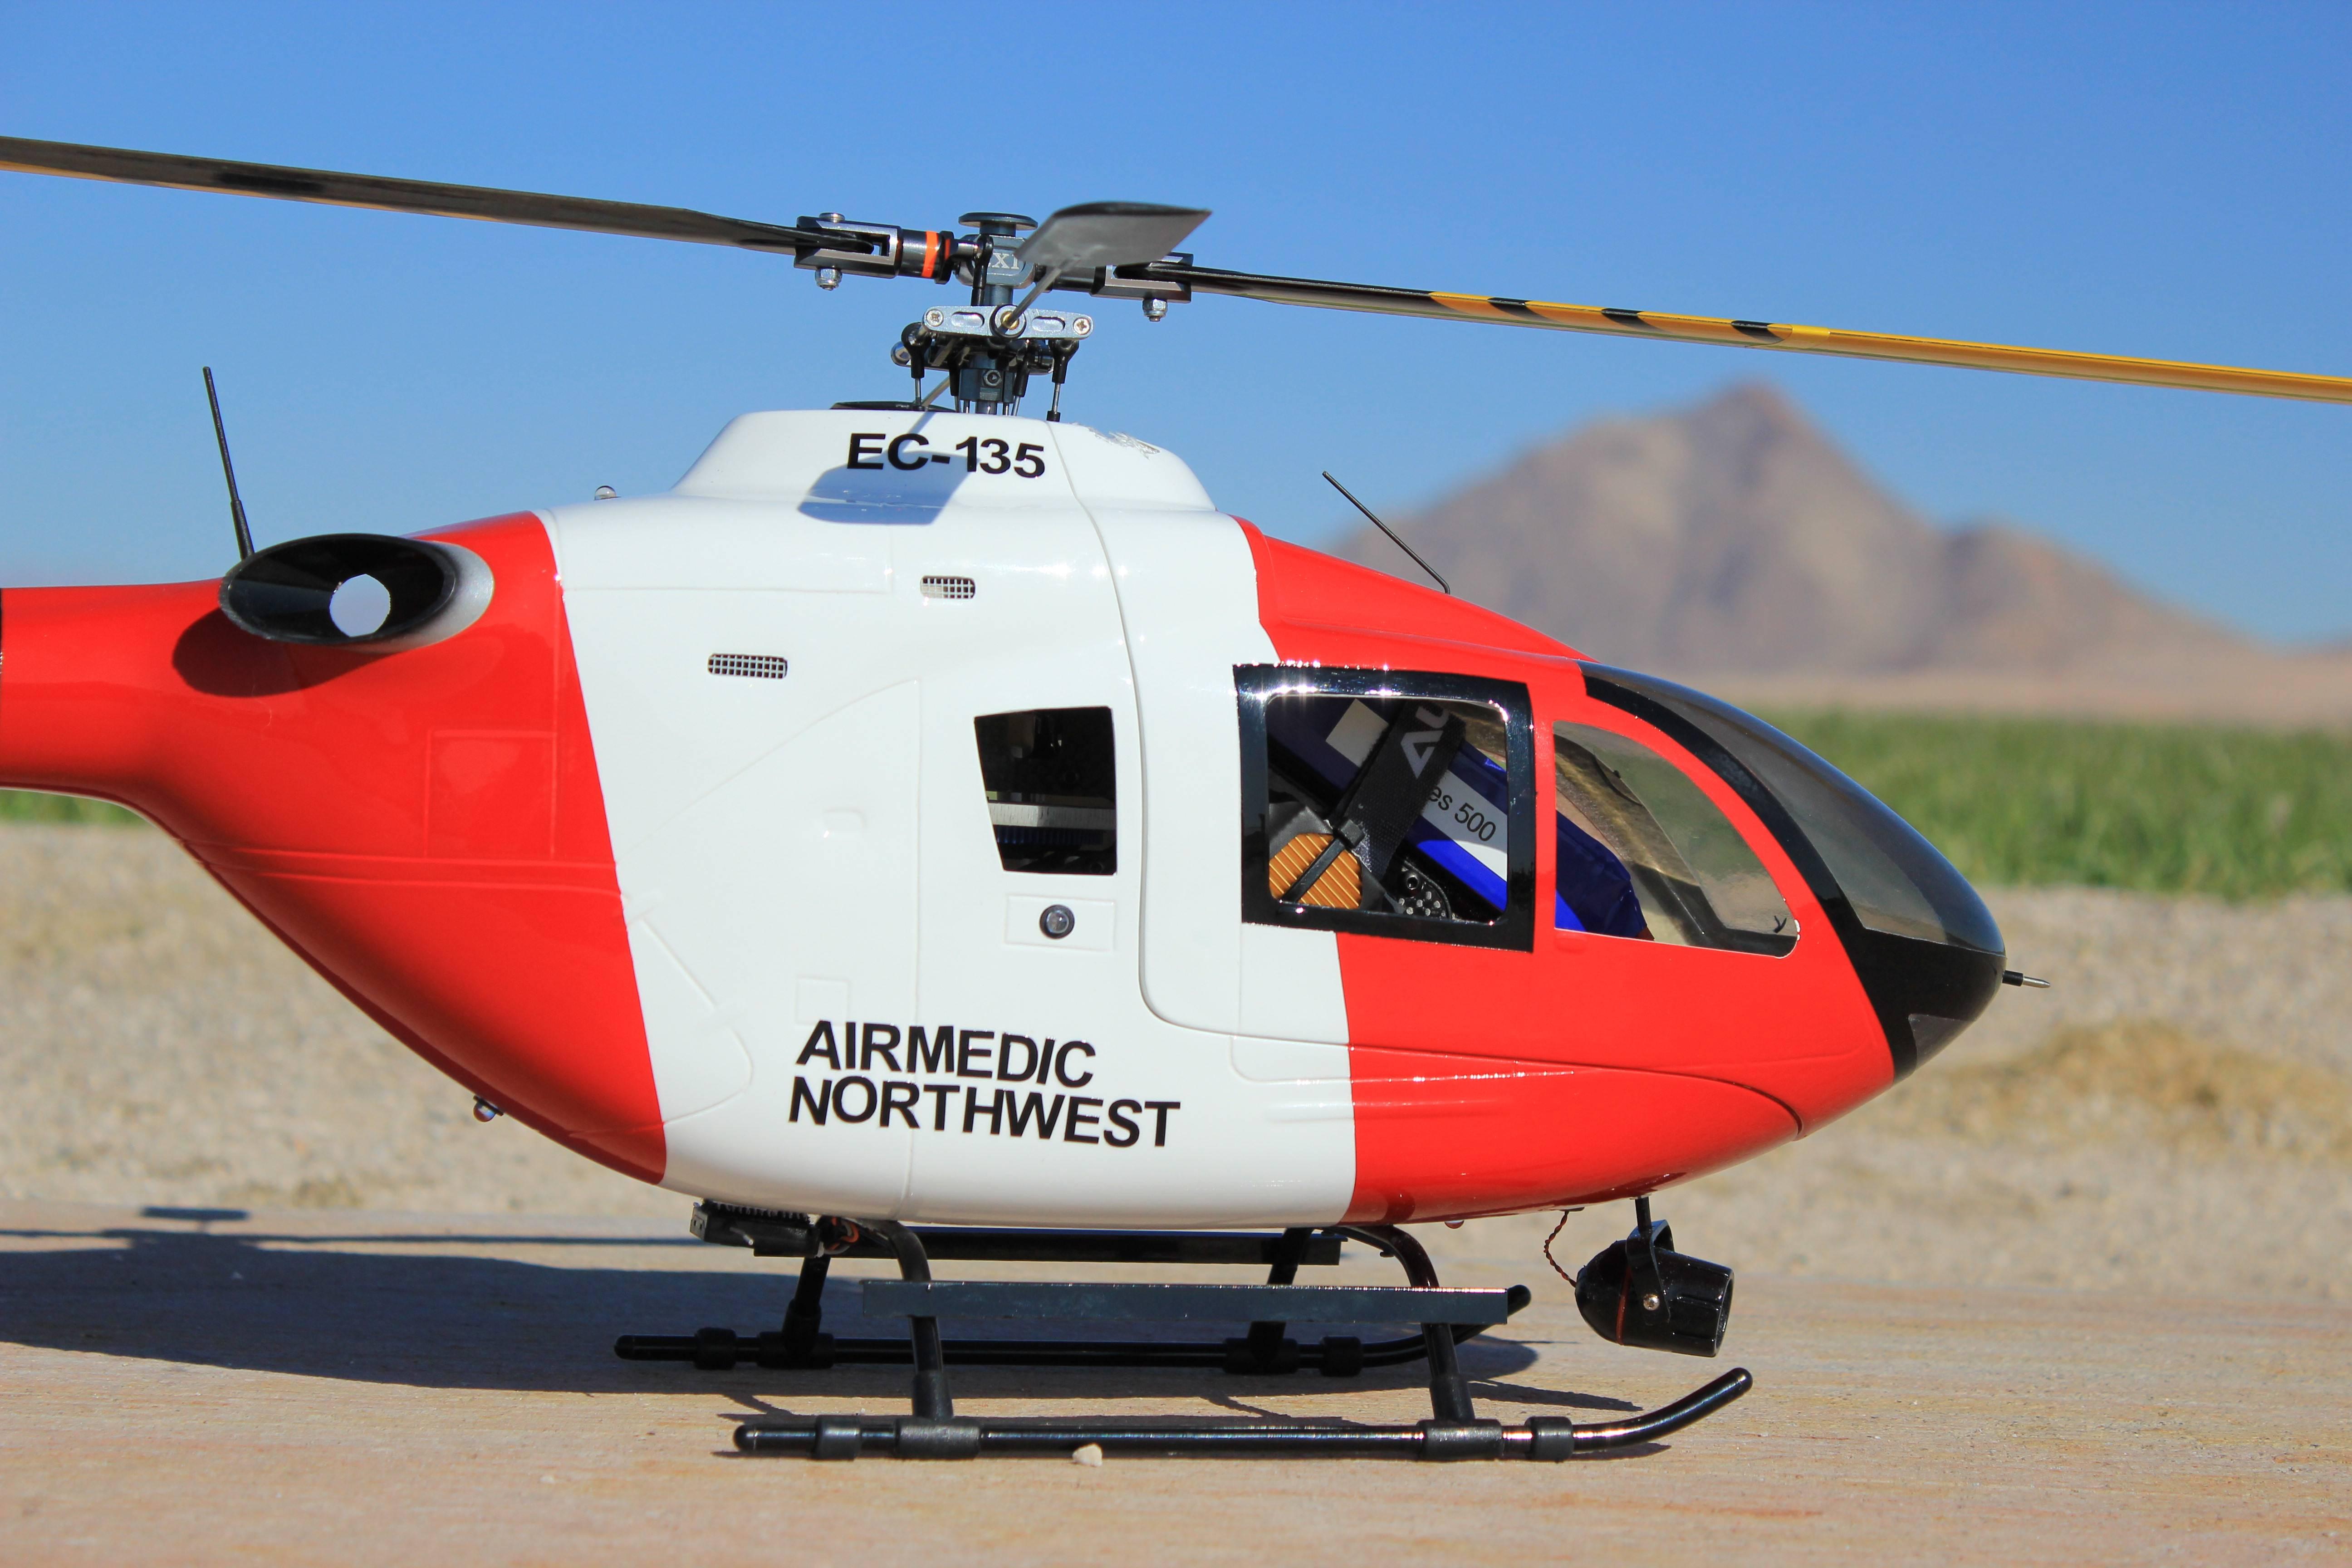 TR450 in the EC135 body